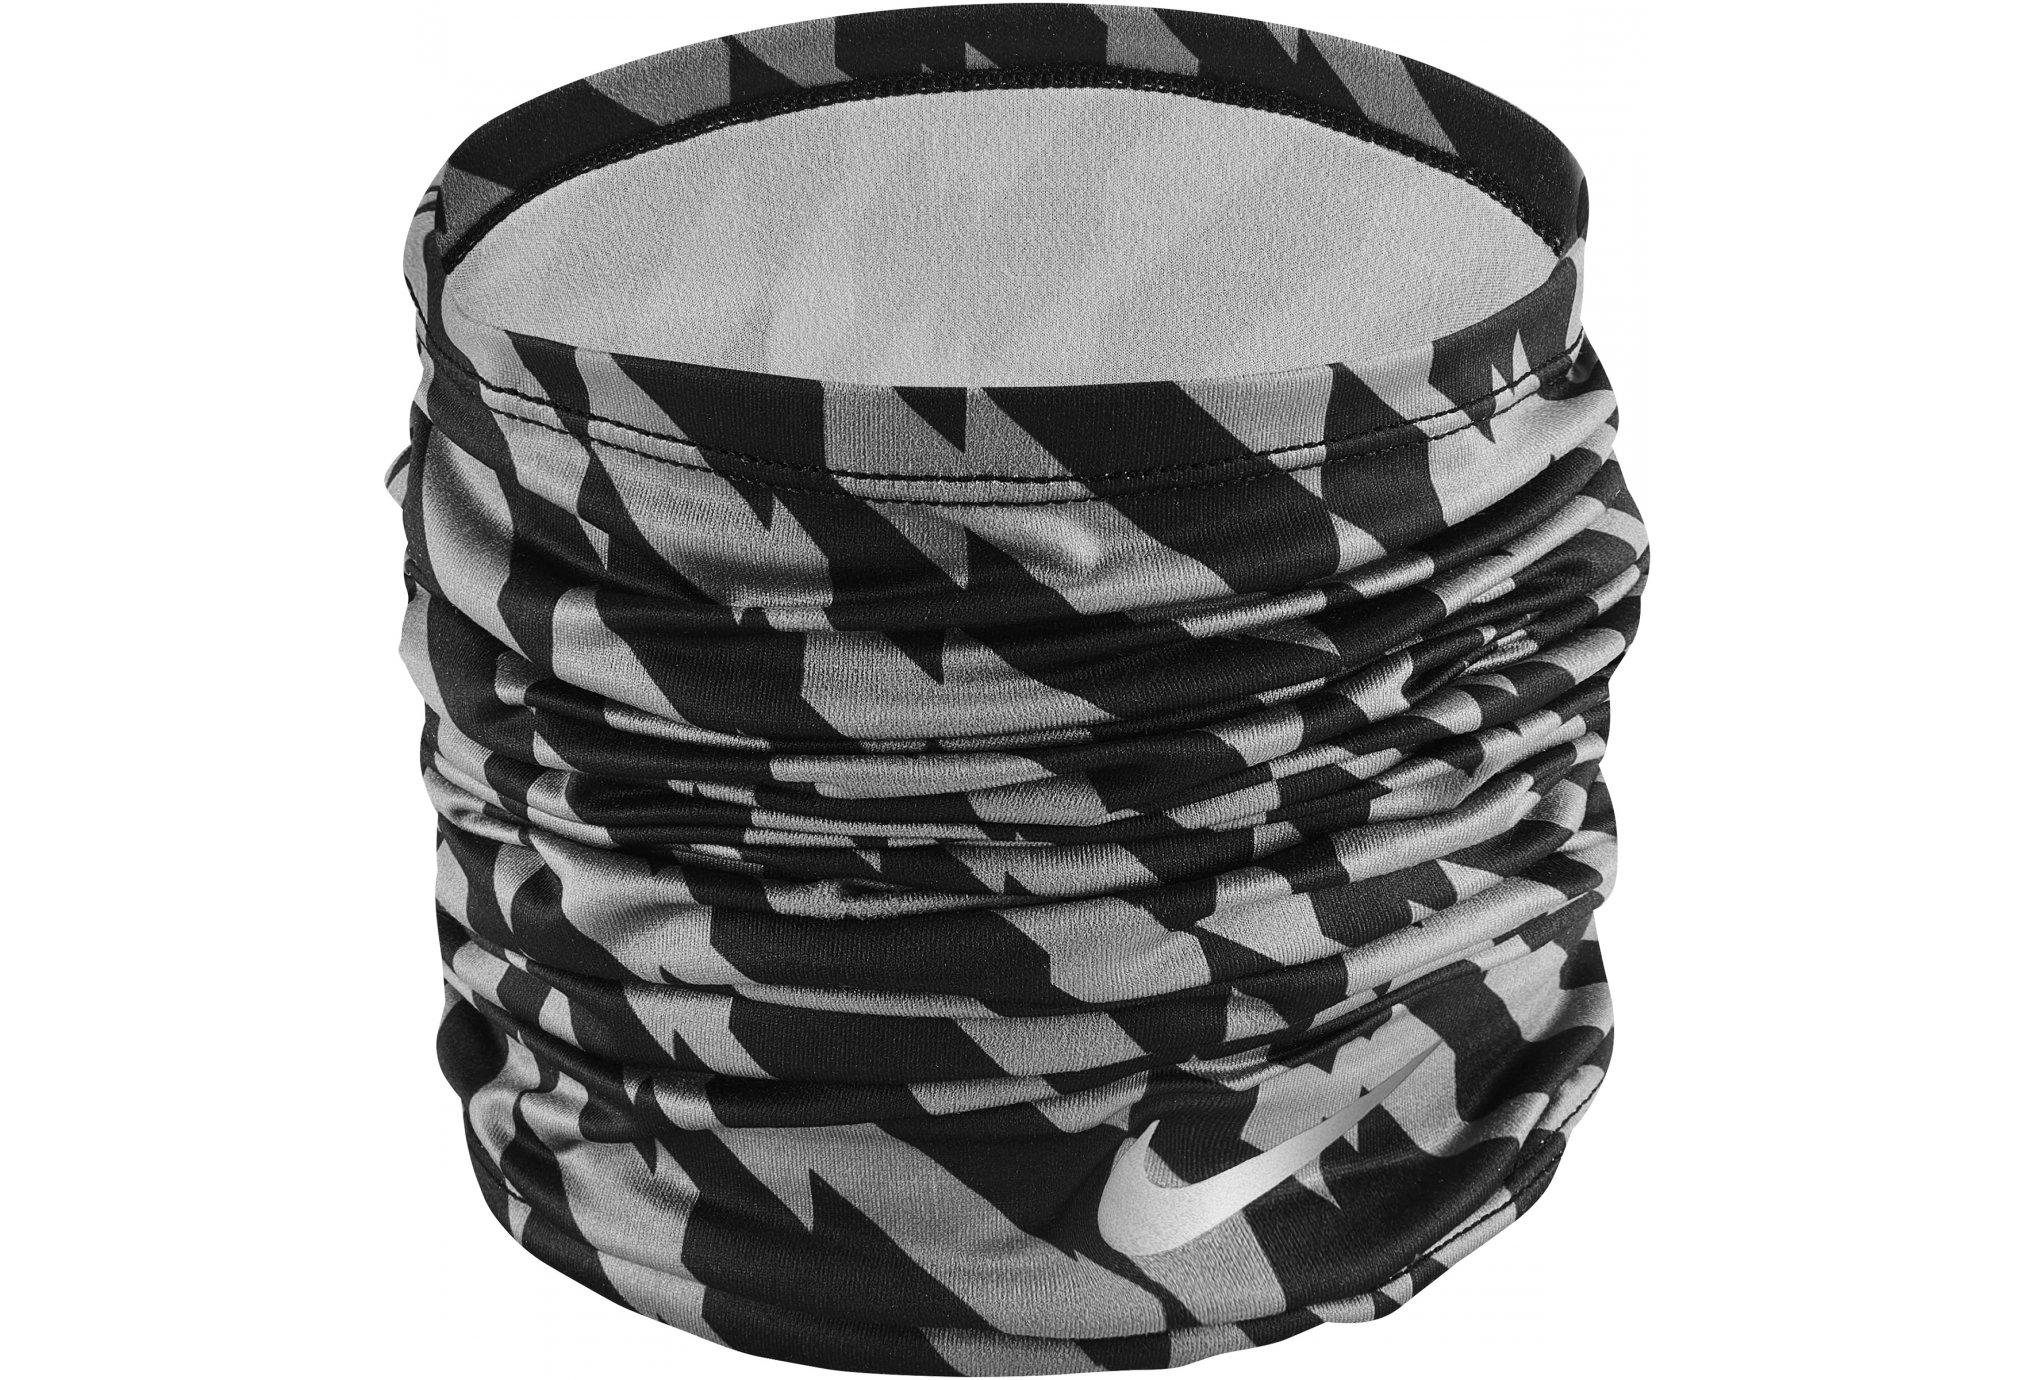 Nike Dry Neck Wrap Tours de cou